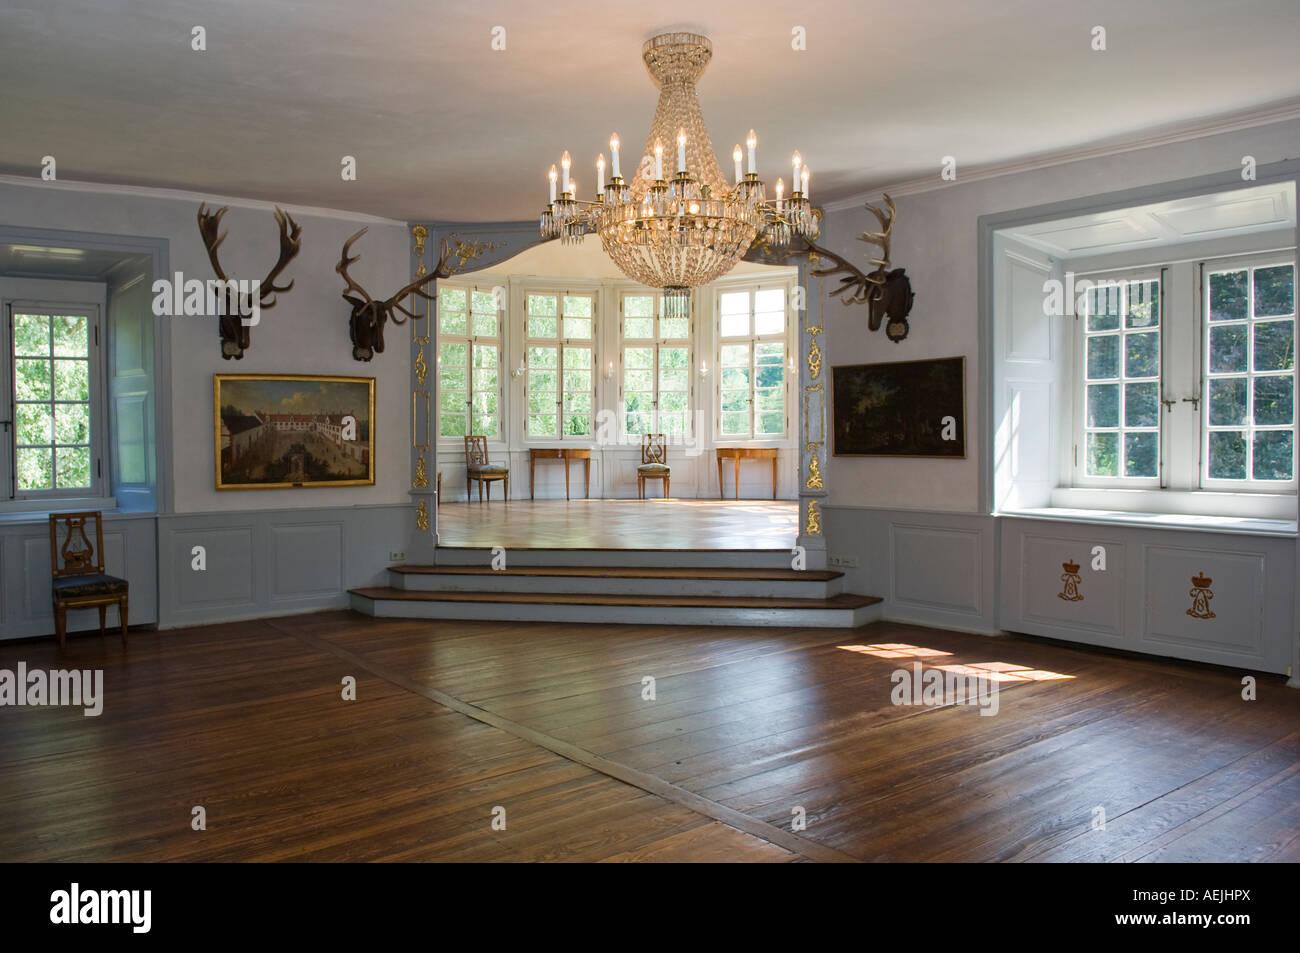 historical hunting lodge kranichstein darmstadt hesse germany stock photo royalty free image. Black Bedroom Furniture Sets. Home Design Ideas